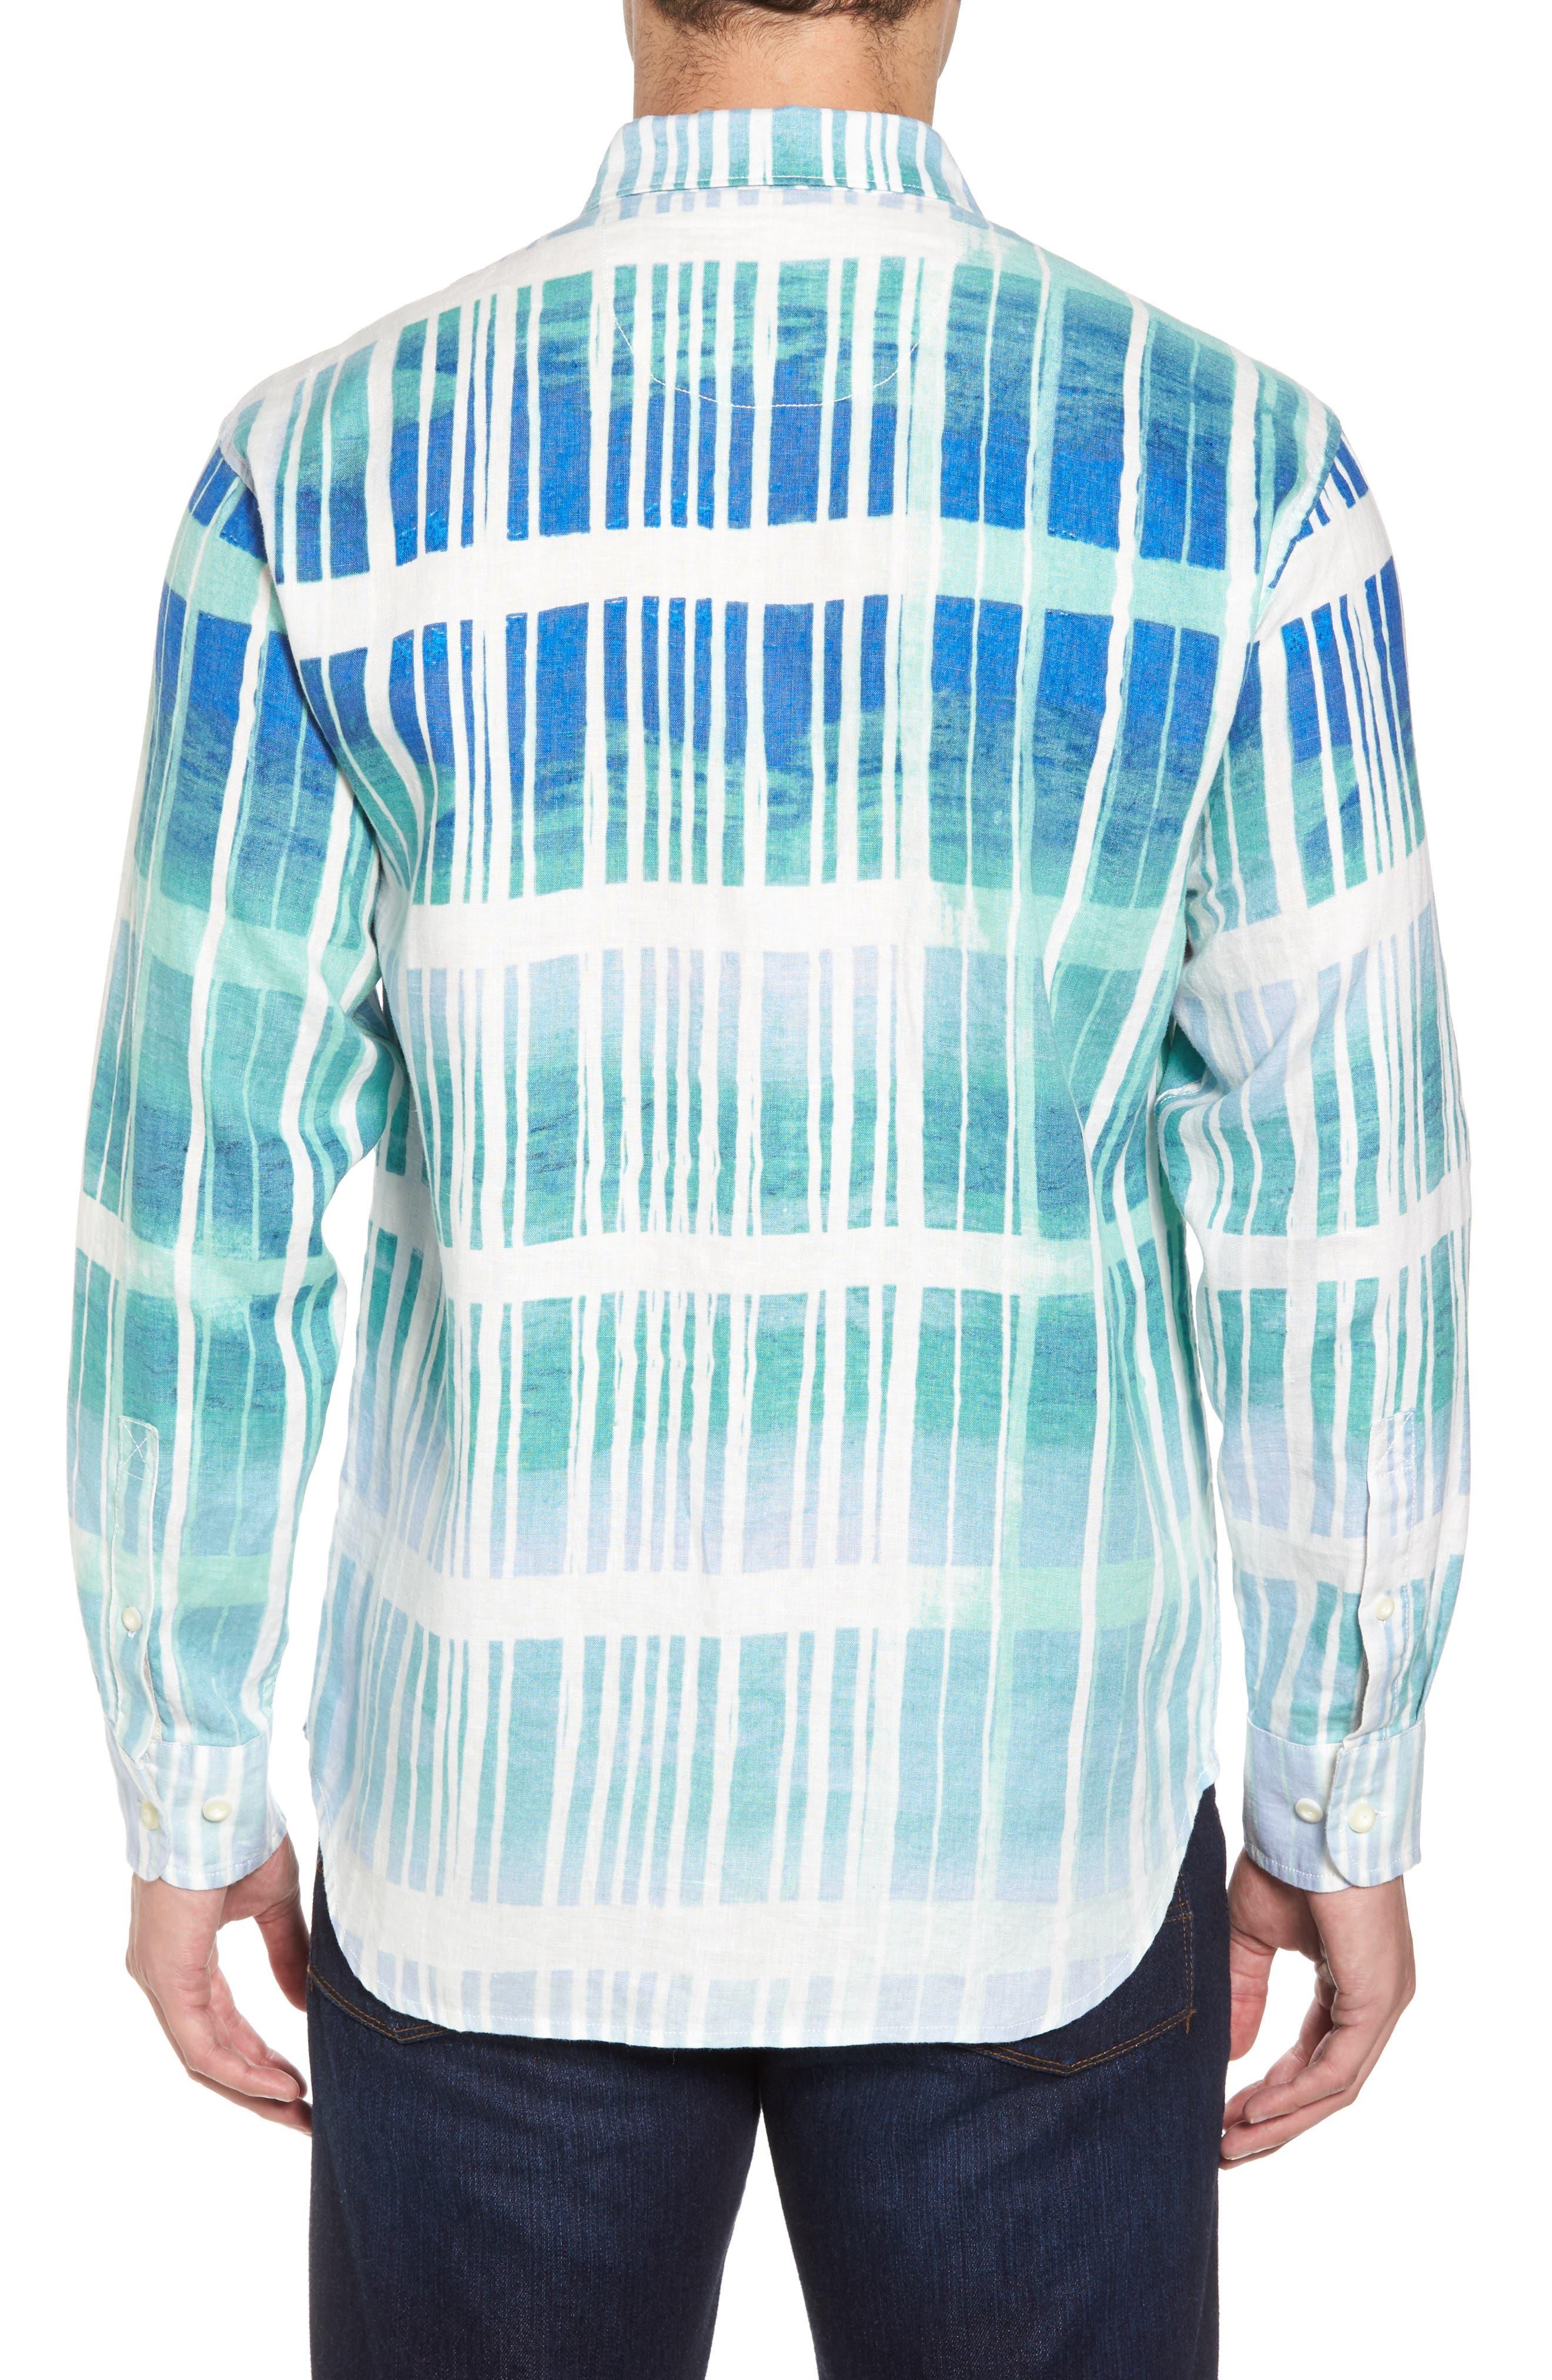 Okeechobee Ombré Breezer Sport Shirt,                             Alternate thumbnail 2, color,                             Santorini Blue